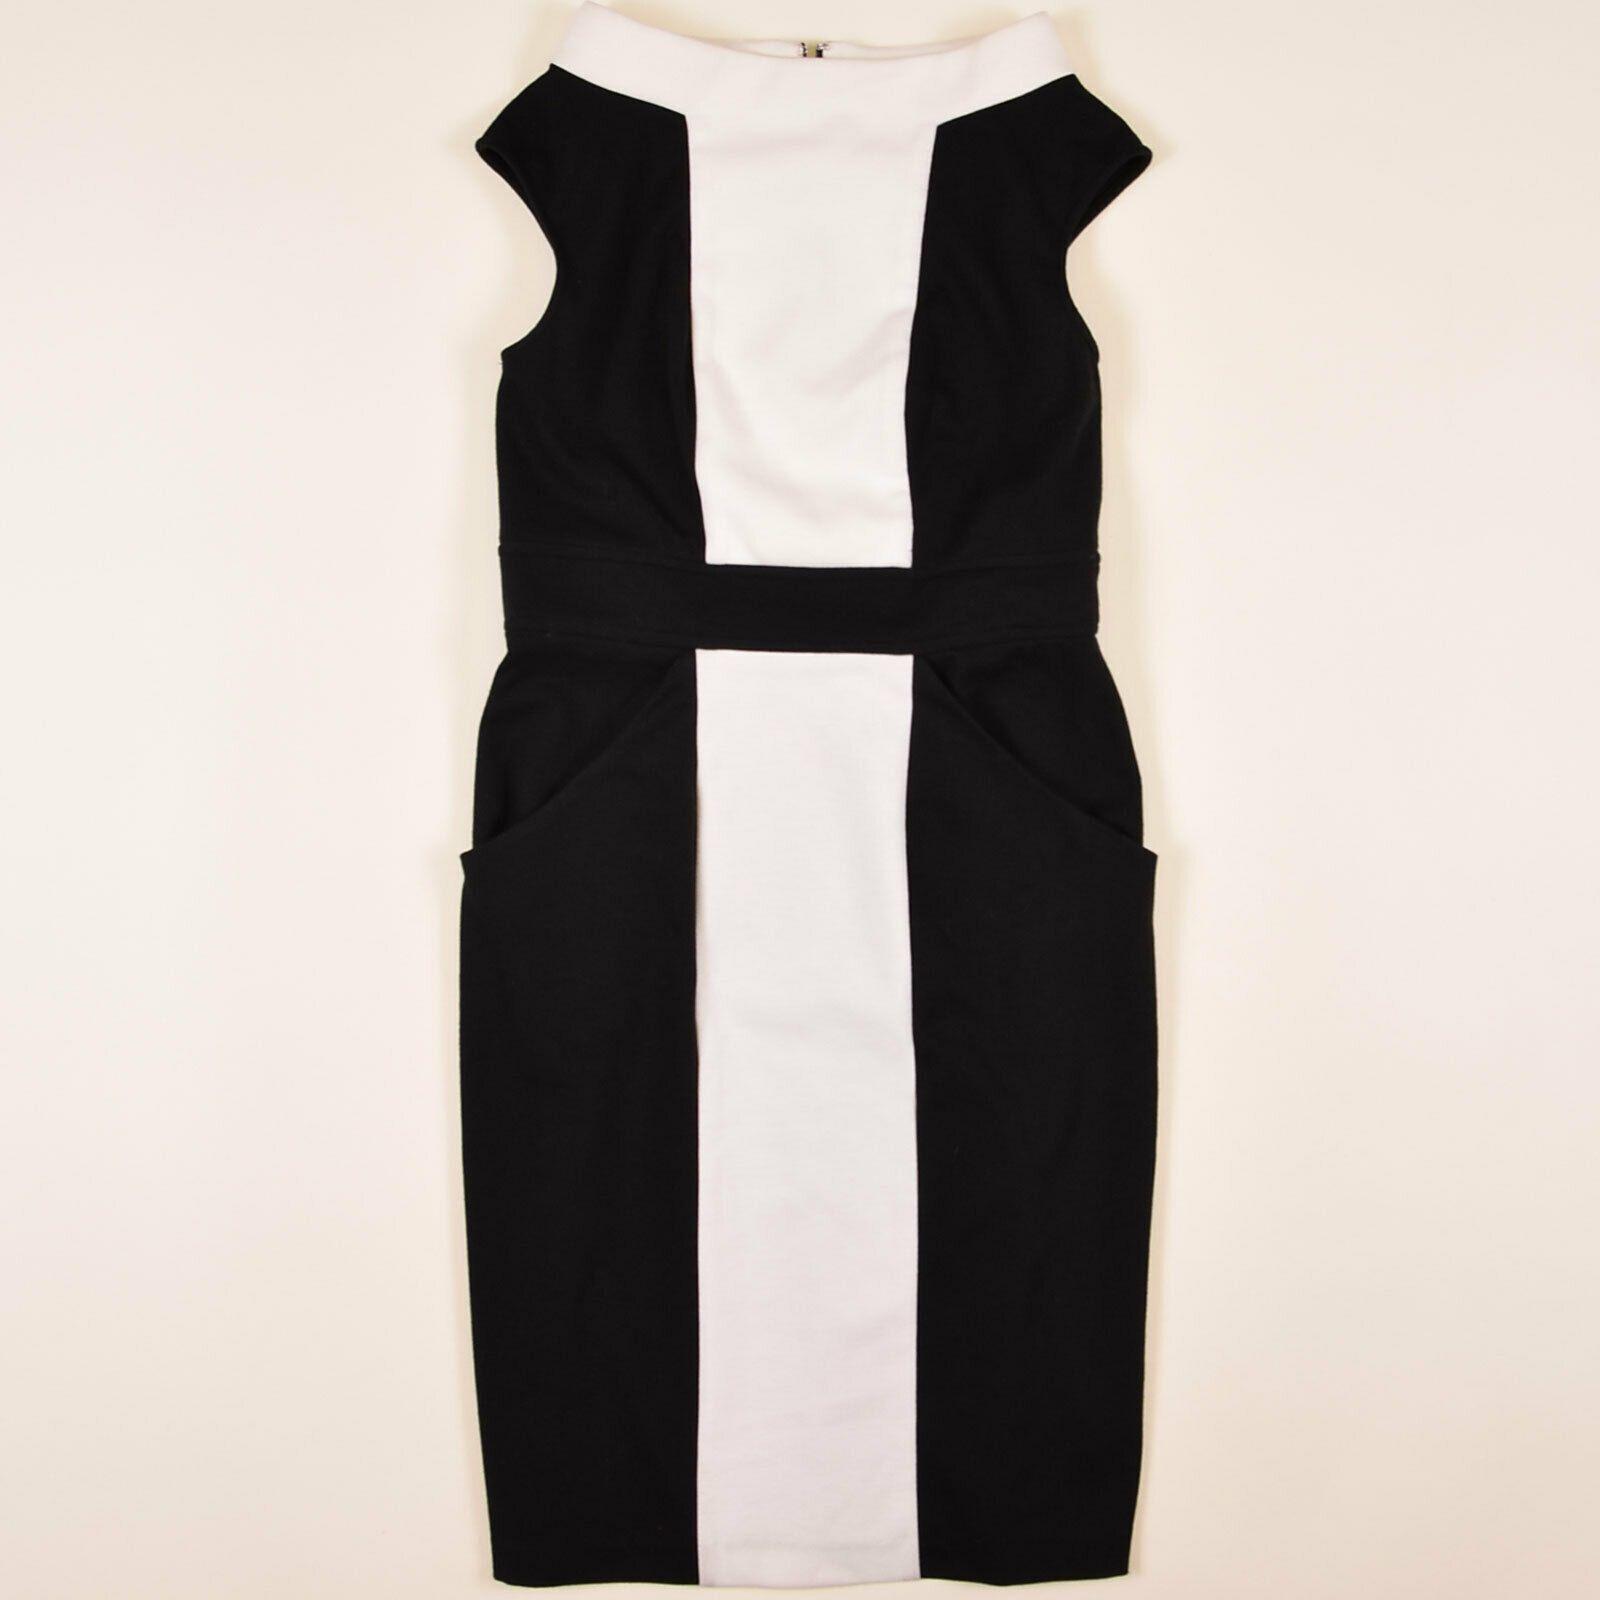 Adrianna Papell Damen Kleid Dress Etuikleid Gr.10 Elegant Business